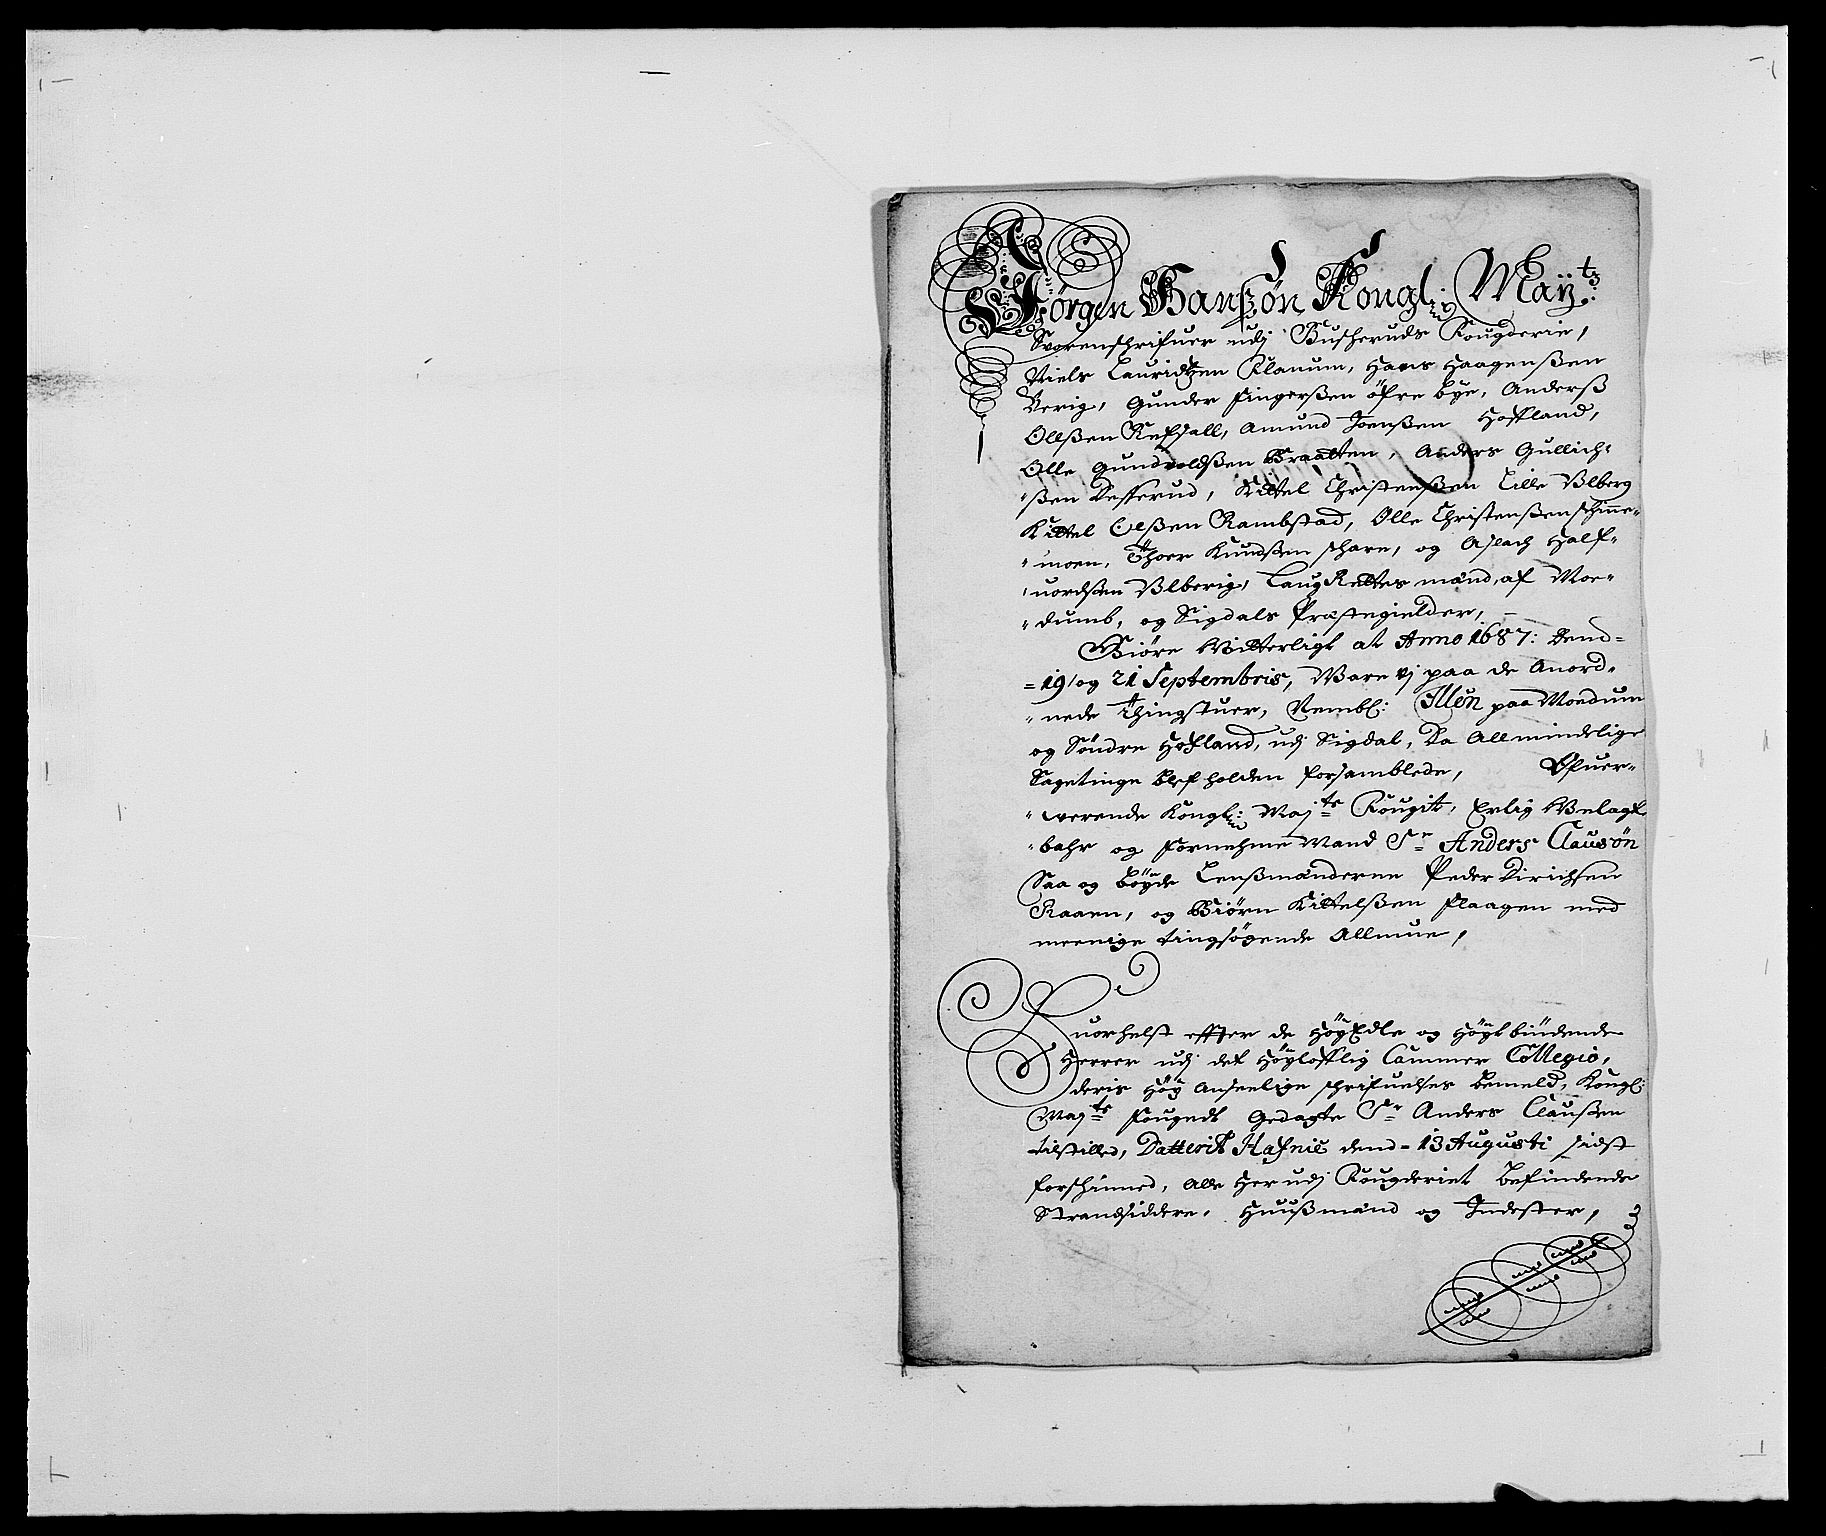 RA, Rentekammeret inntil 1814, Reviderte regnskaper, Fogderegnskap, R25/L1679: Fogderegnskap Buskerud, 1687-1688, s. 198